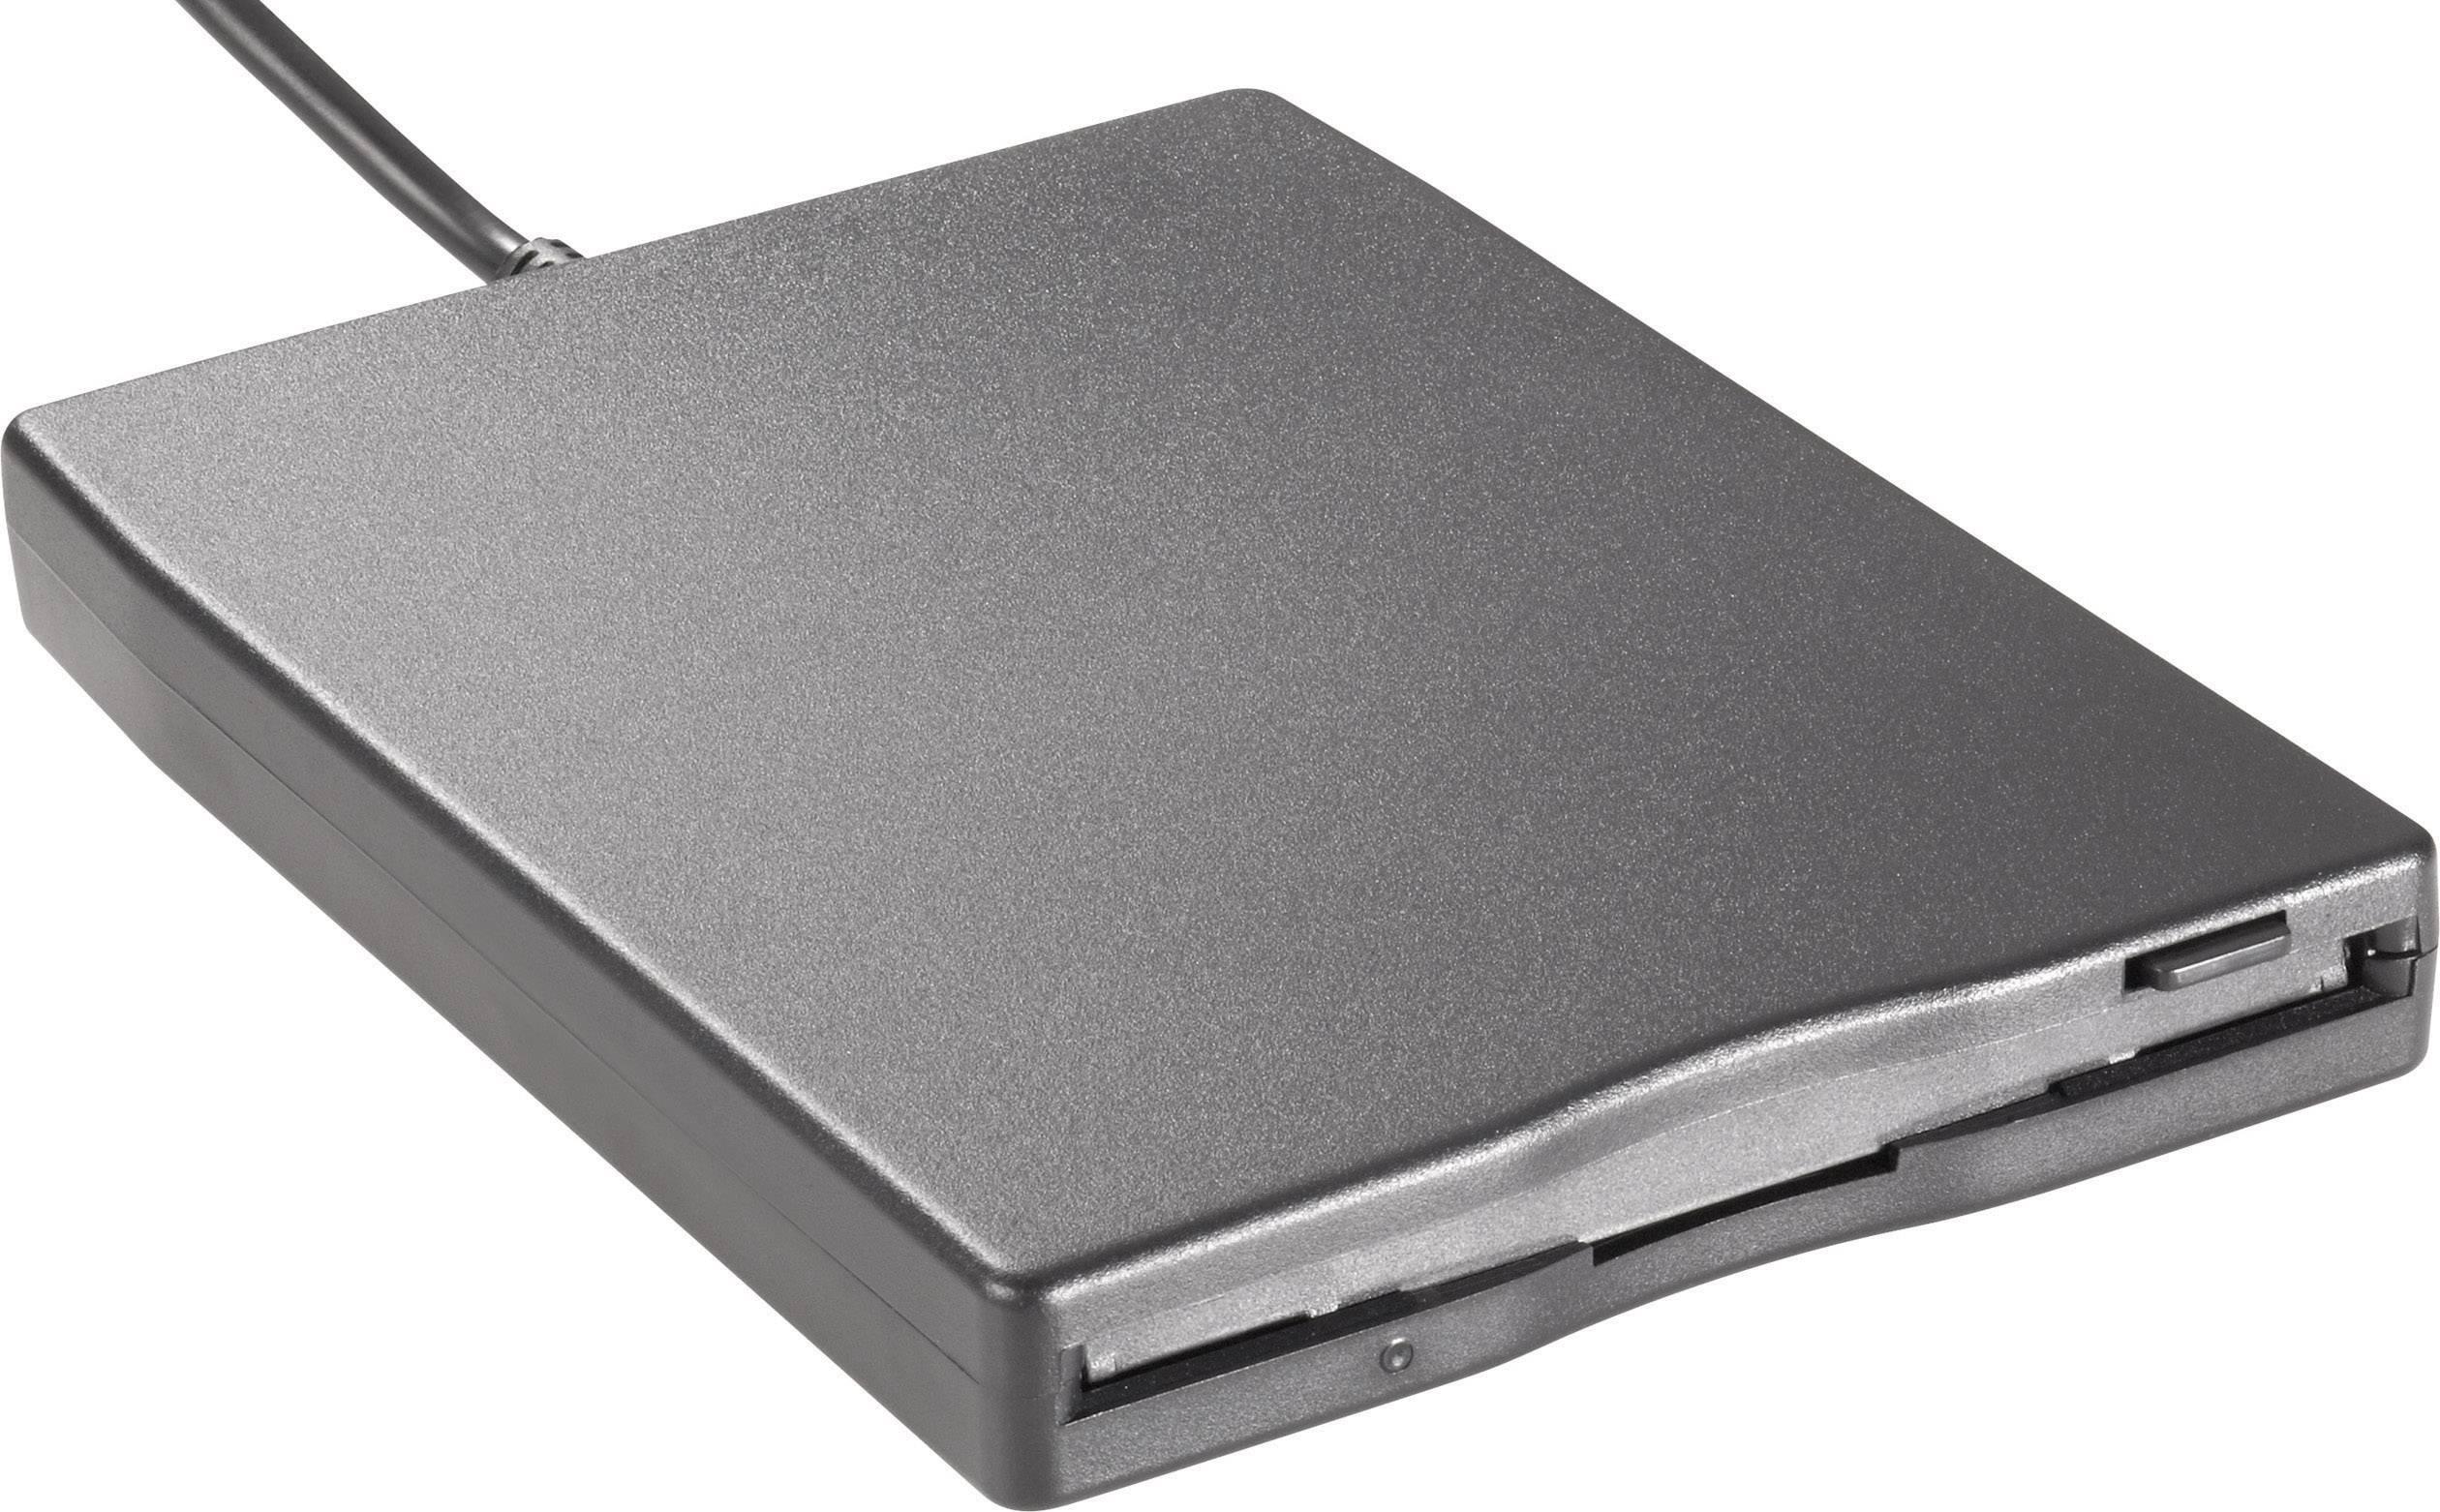 Disketová mechanika baset GEN-144, USB 2.0, 104 x 19 x 143 mm